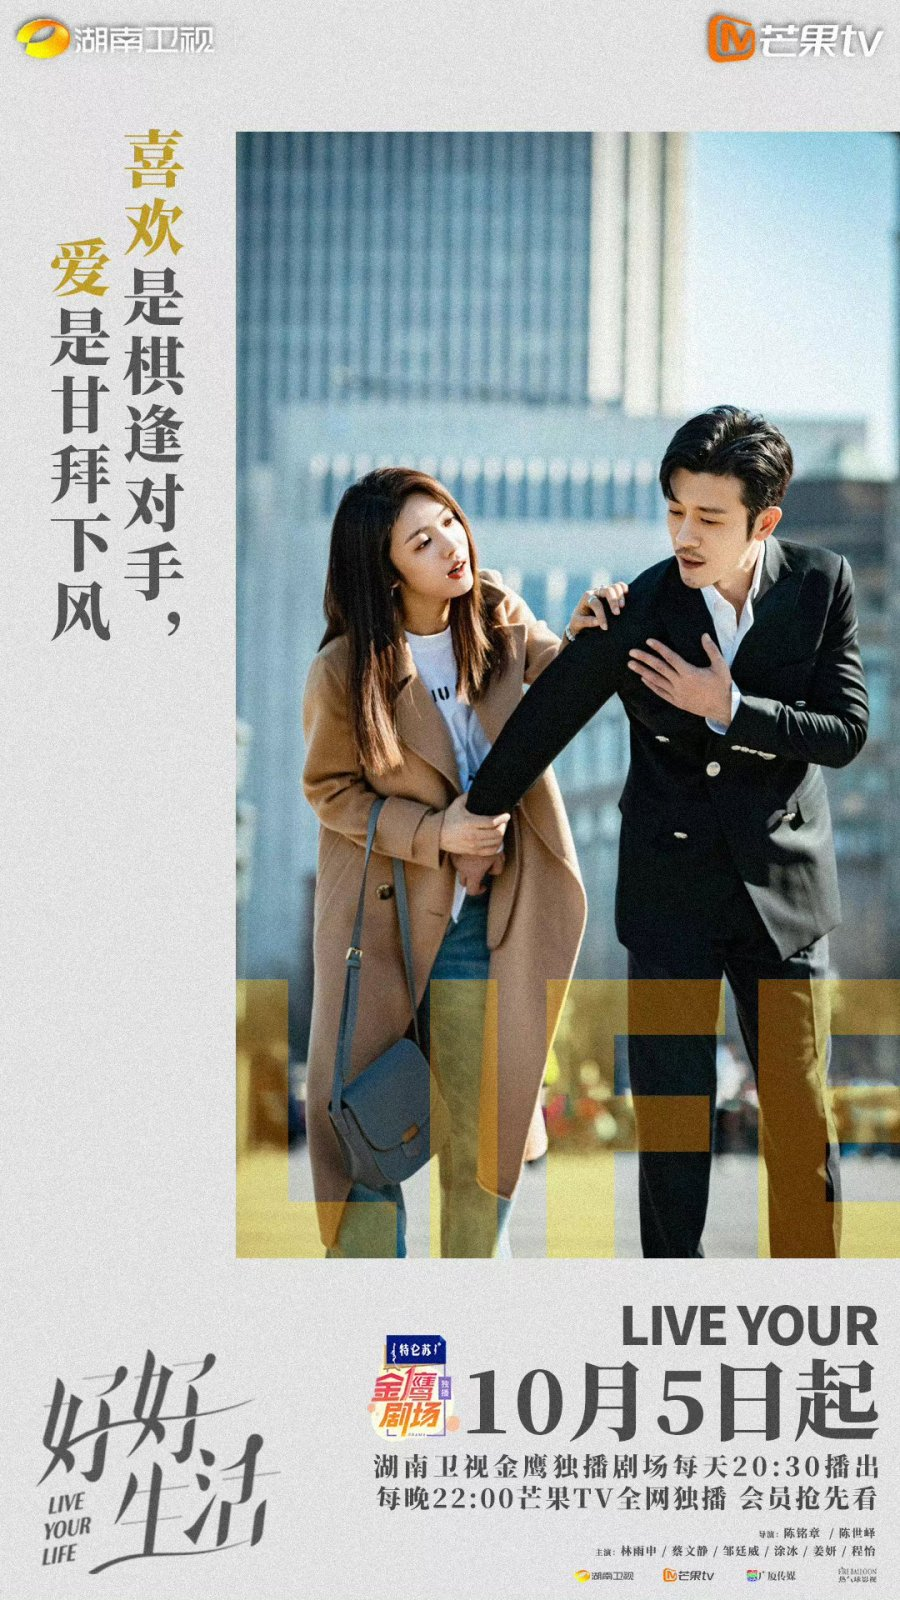 2WYlR 4f - Живи своей жизнью ✦ 2021 ✦ Китай